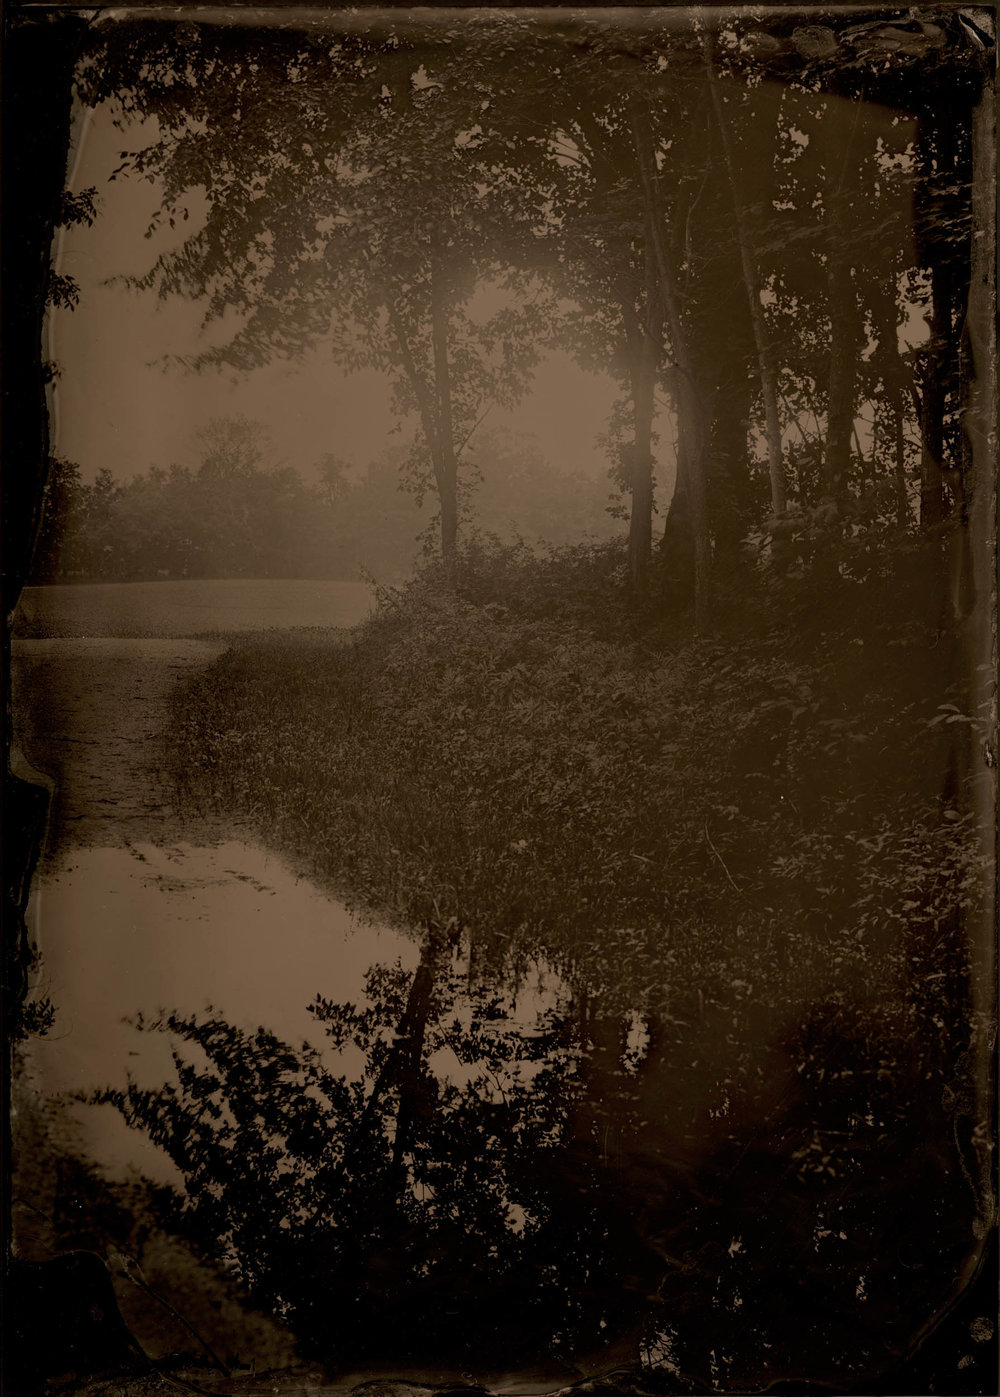 Mud Puddle, ambrotype original, archival pigment print, 40 in. x 50 in., 2018